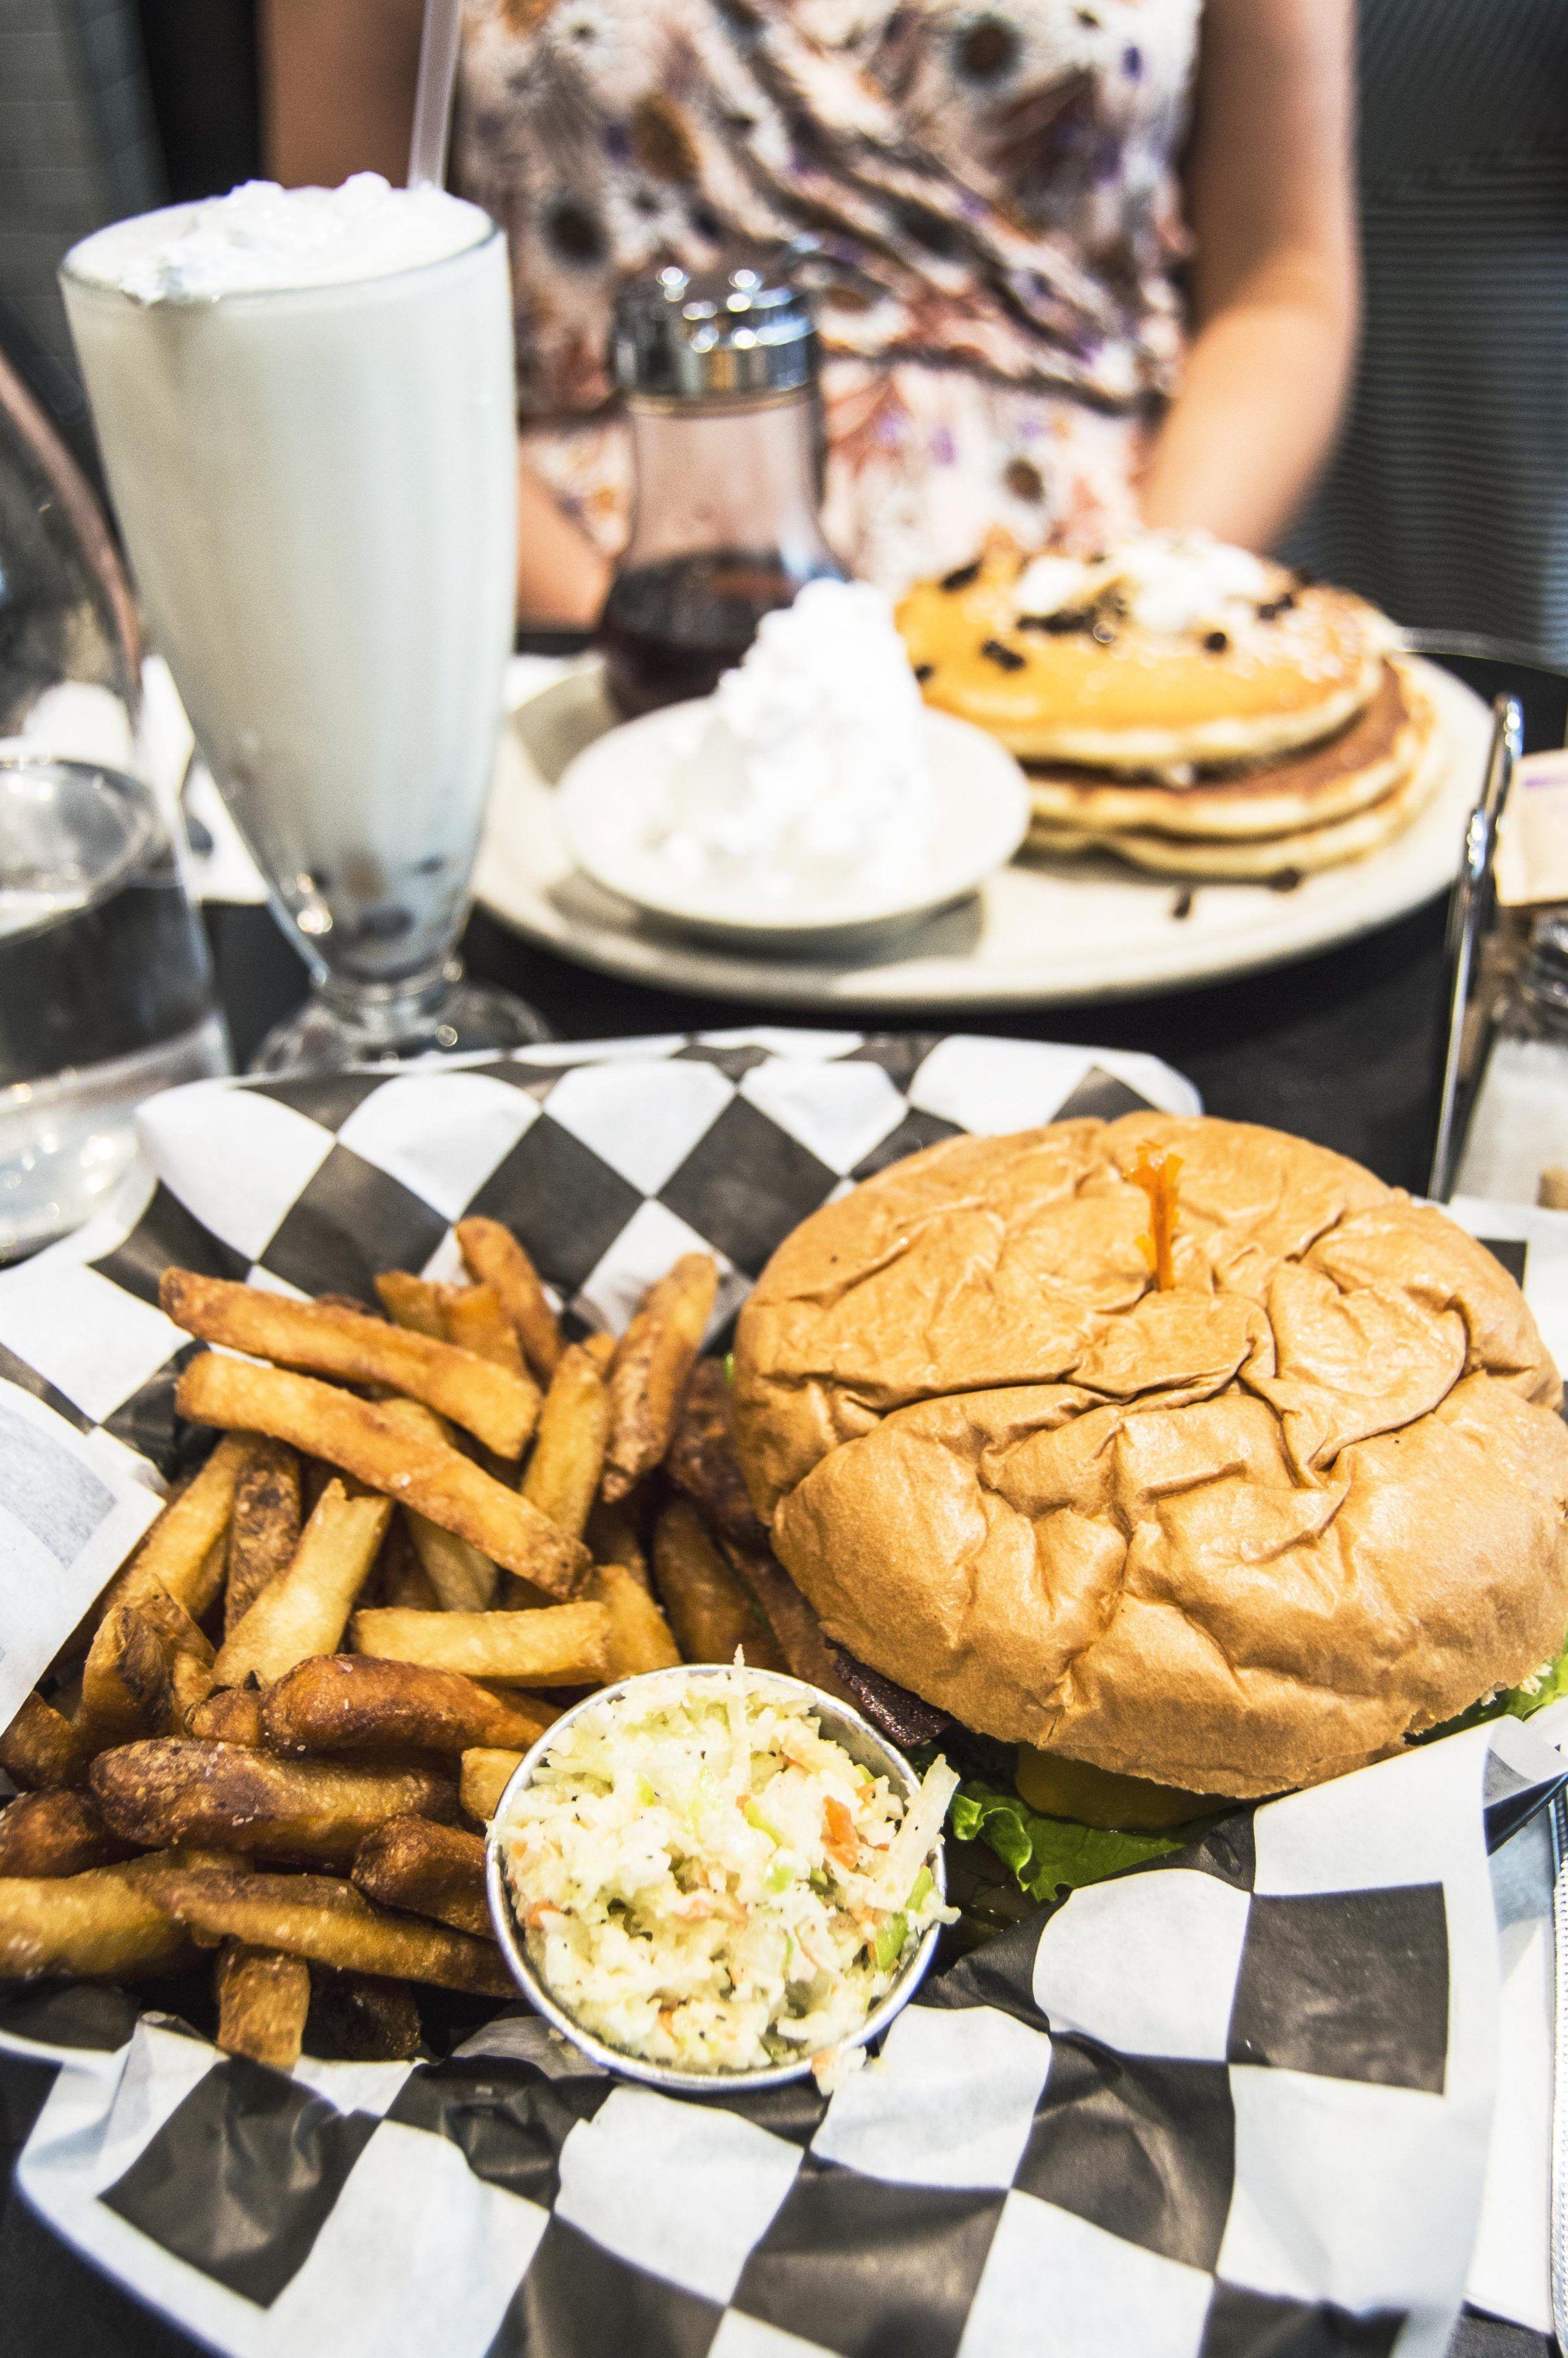 A Vegan In Nyc Part 3 Dining Out In Brooklyn This Vibrant World Vegan Restaurants Nyc Vegan Nyc Vegan Restaurants